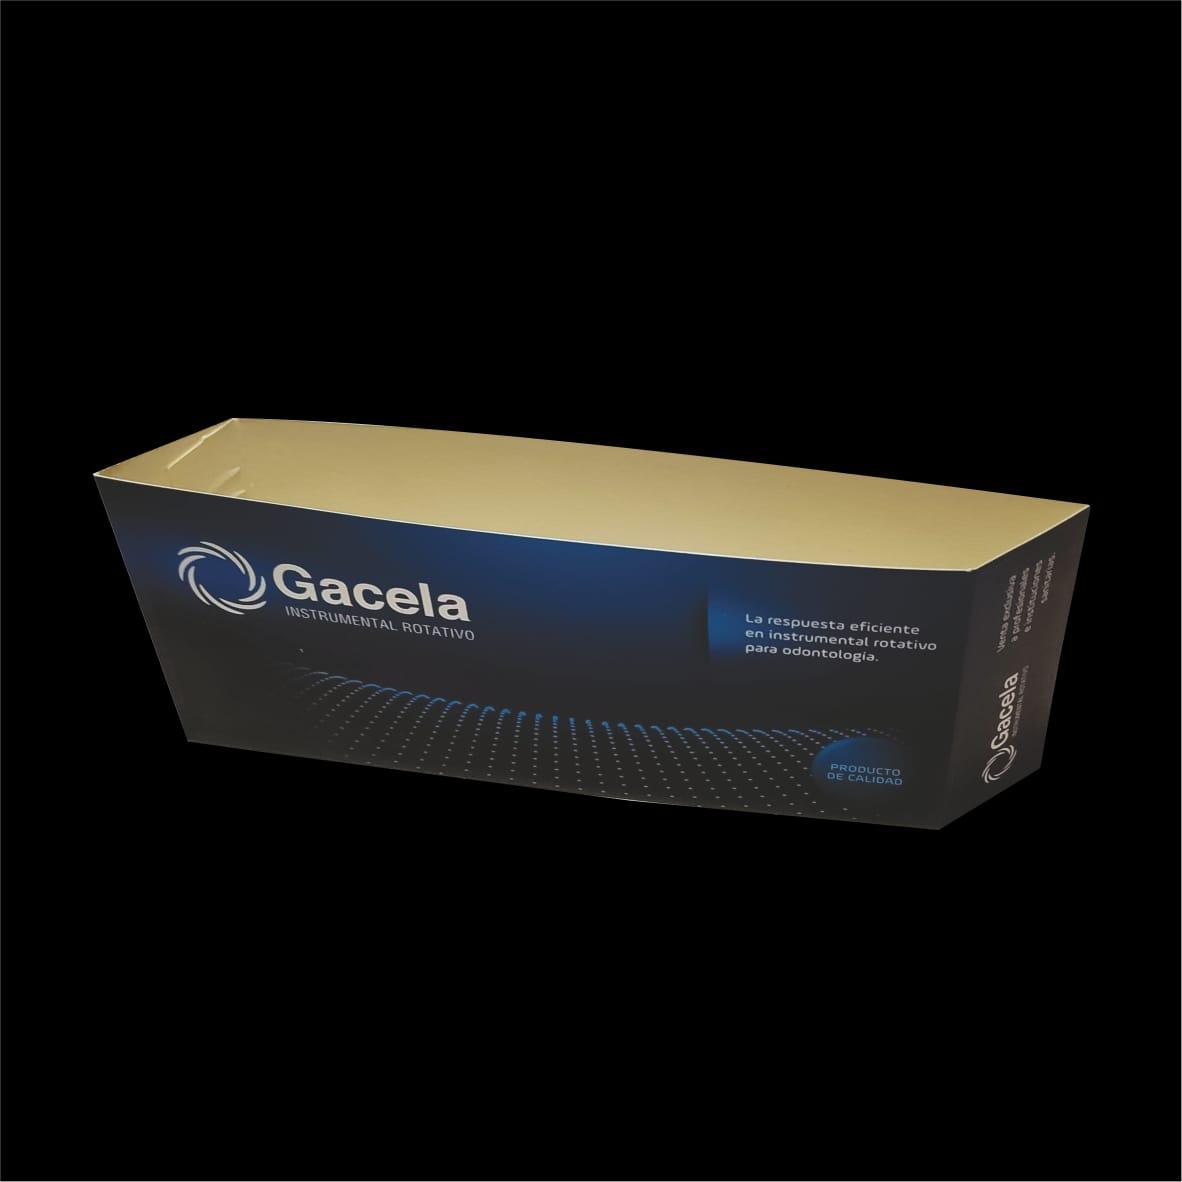 Packaging  Gacela